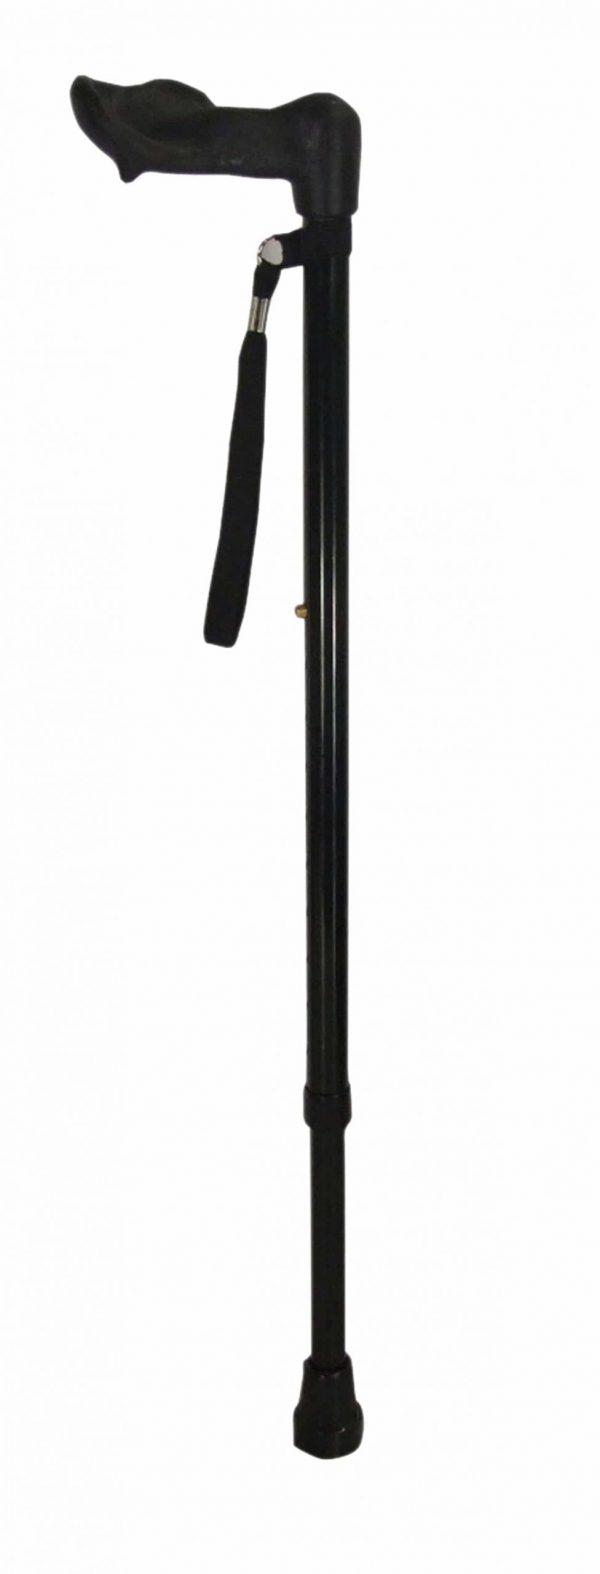 Ergonomic Handled Walking Stick - Left Handed